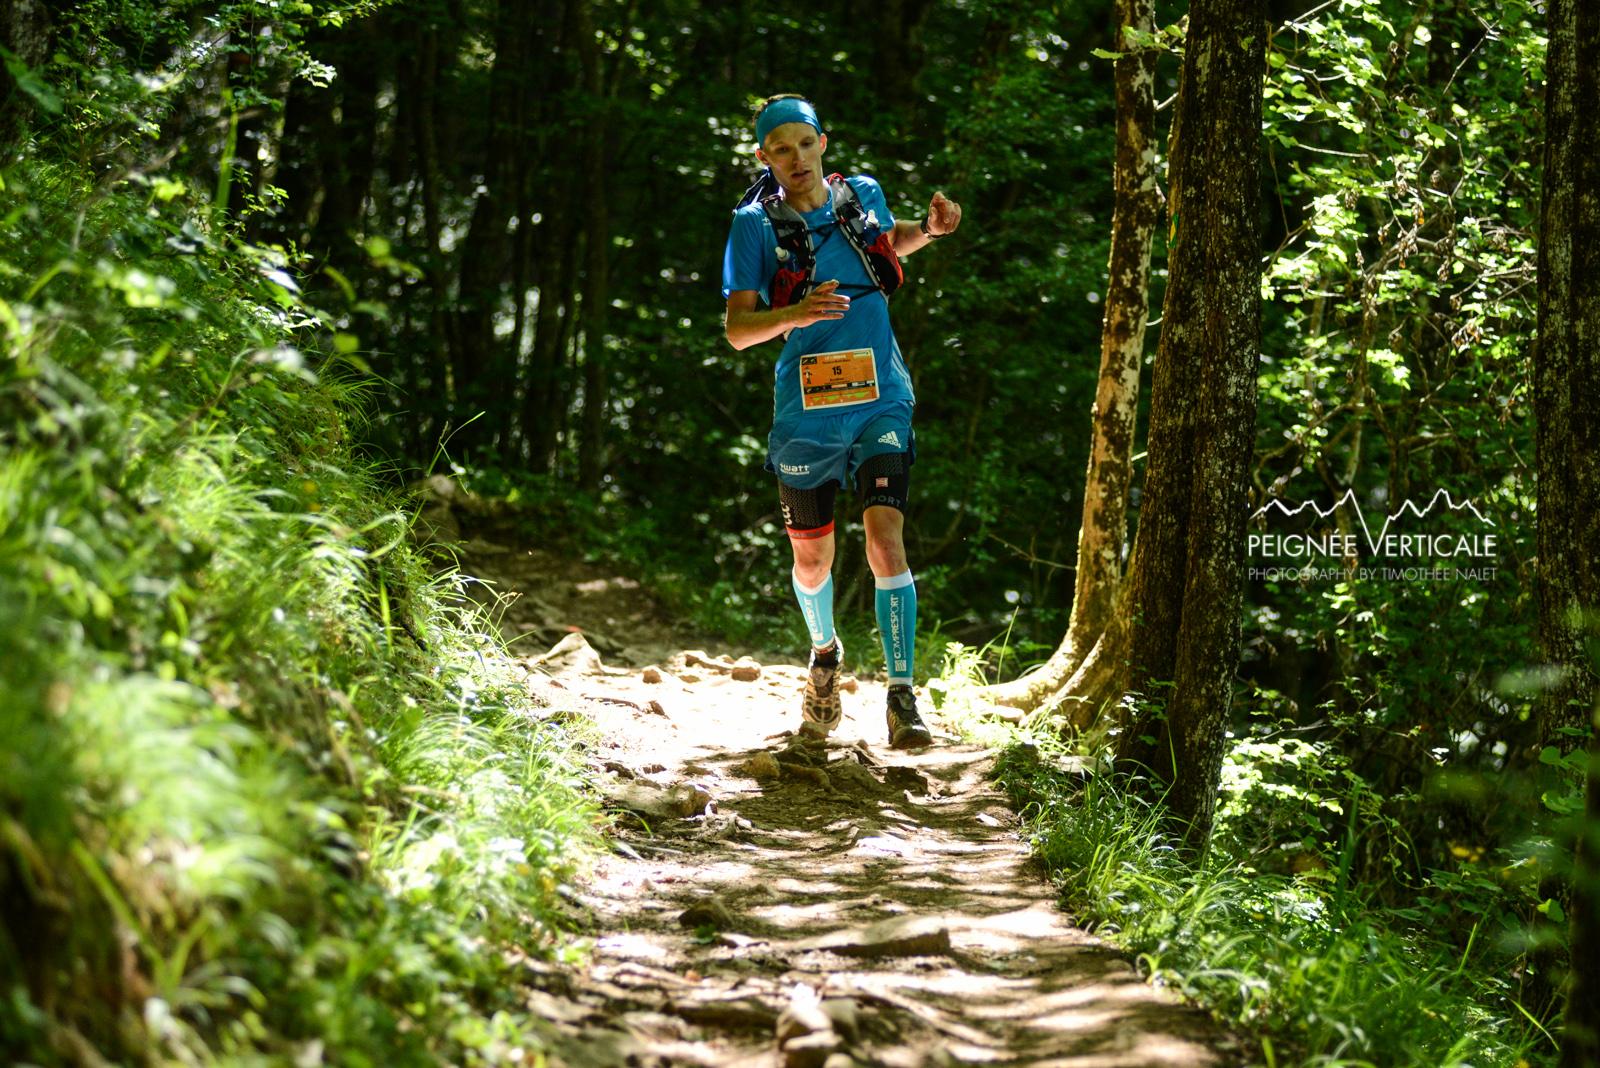 MaxiRace-Annecy-2014-Team-Hoka-Timothee-Nalet-1186.jpg